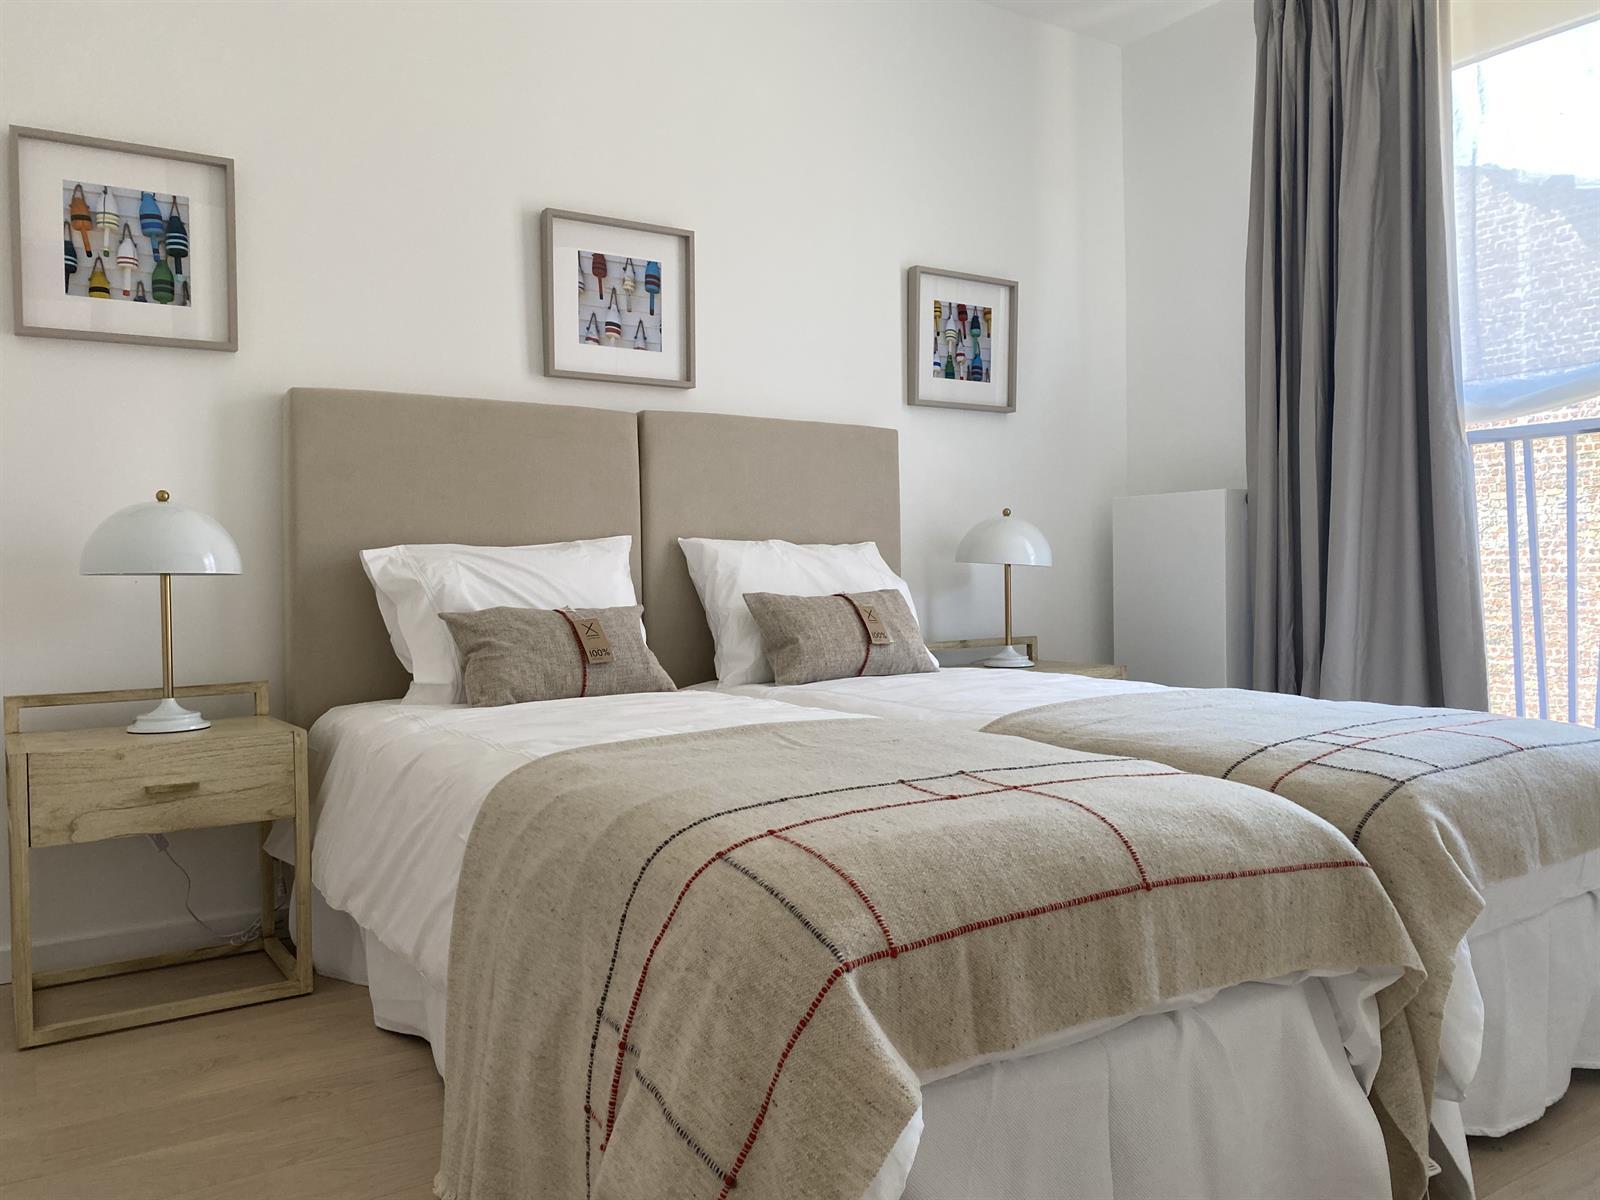 Appartement - Woluwe-Saint-Lambert - #4455478-5